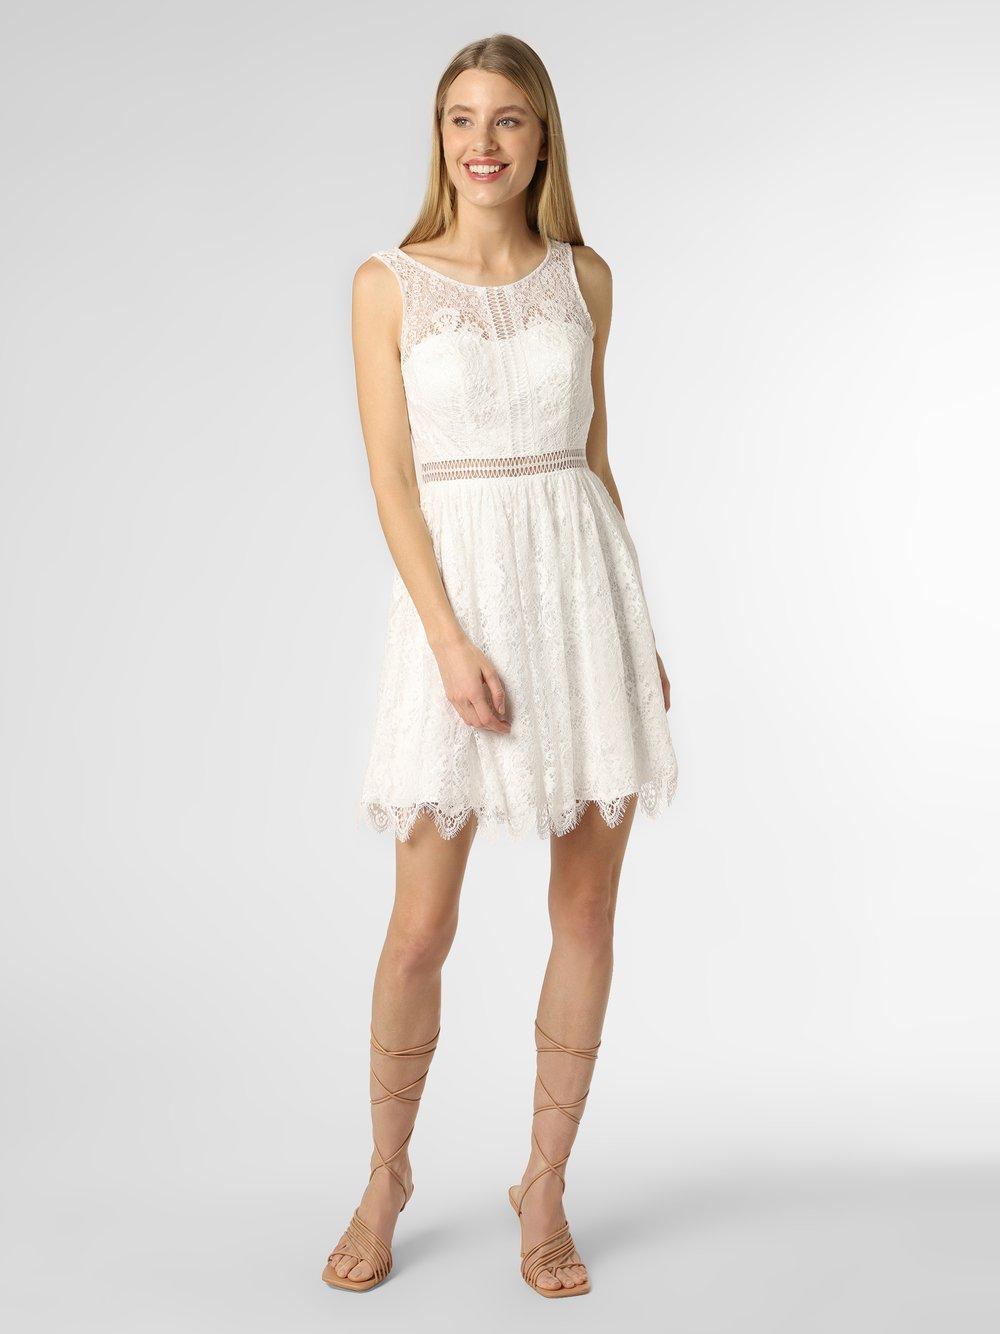 Laona – Damska sukienka wieczorowa, beżowy Van Graaf 466898-0001-00400